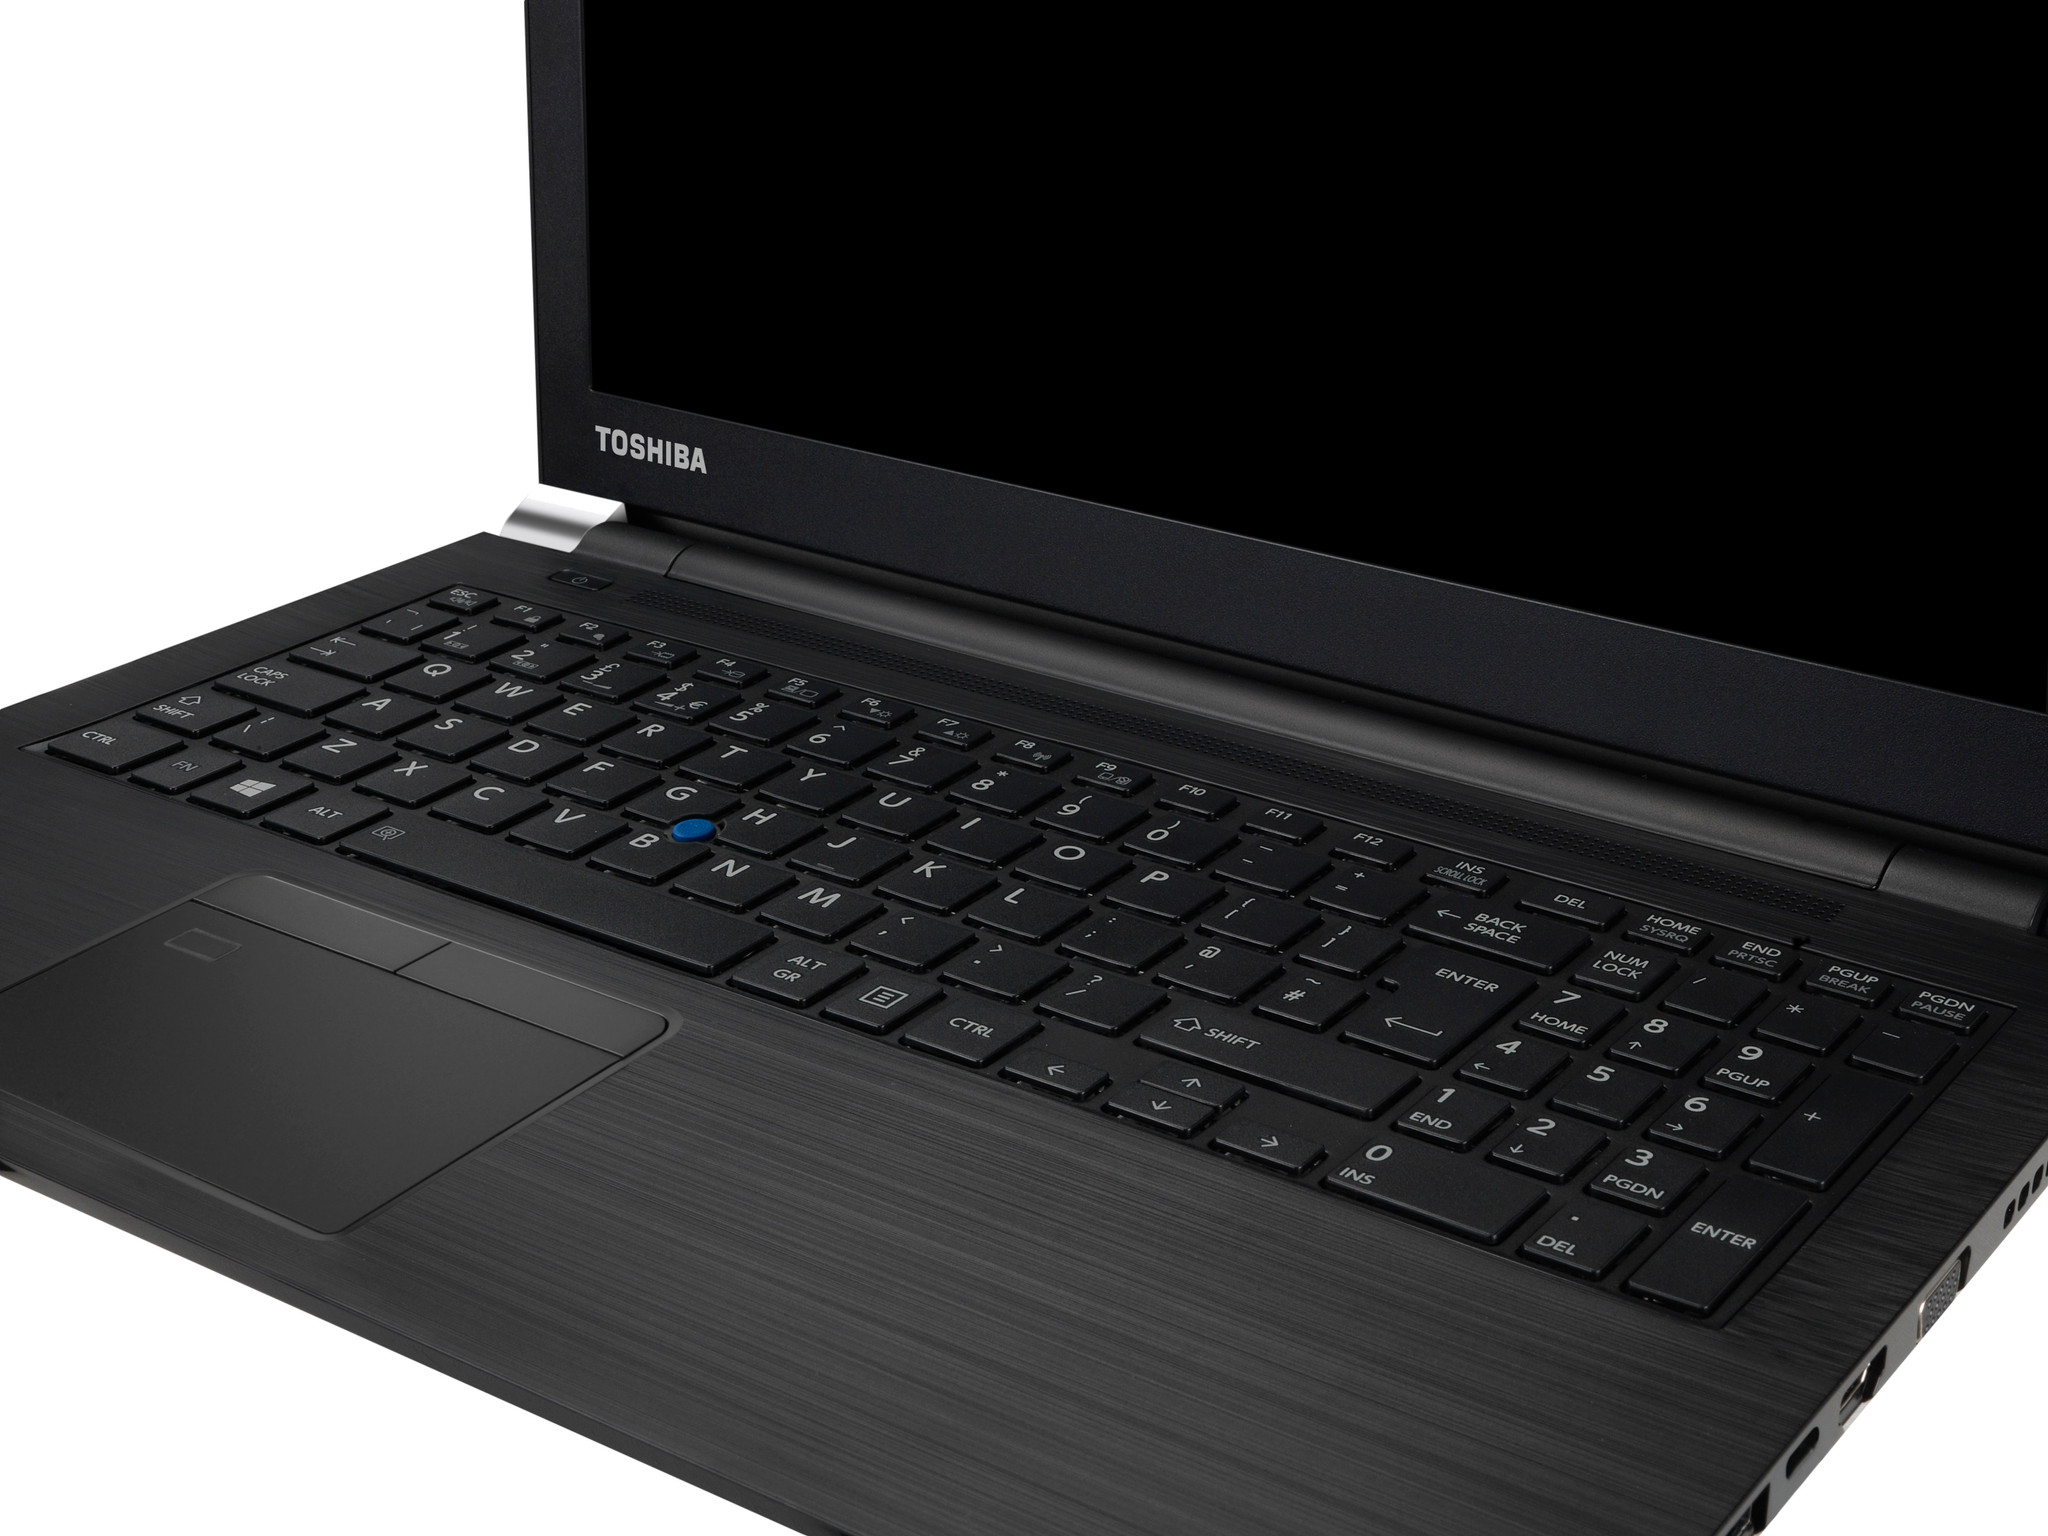 Beste laptop merken Toshiba